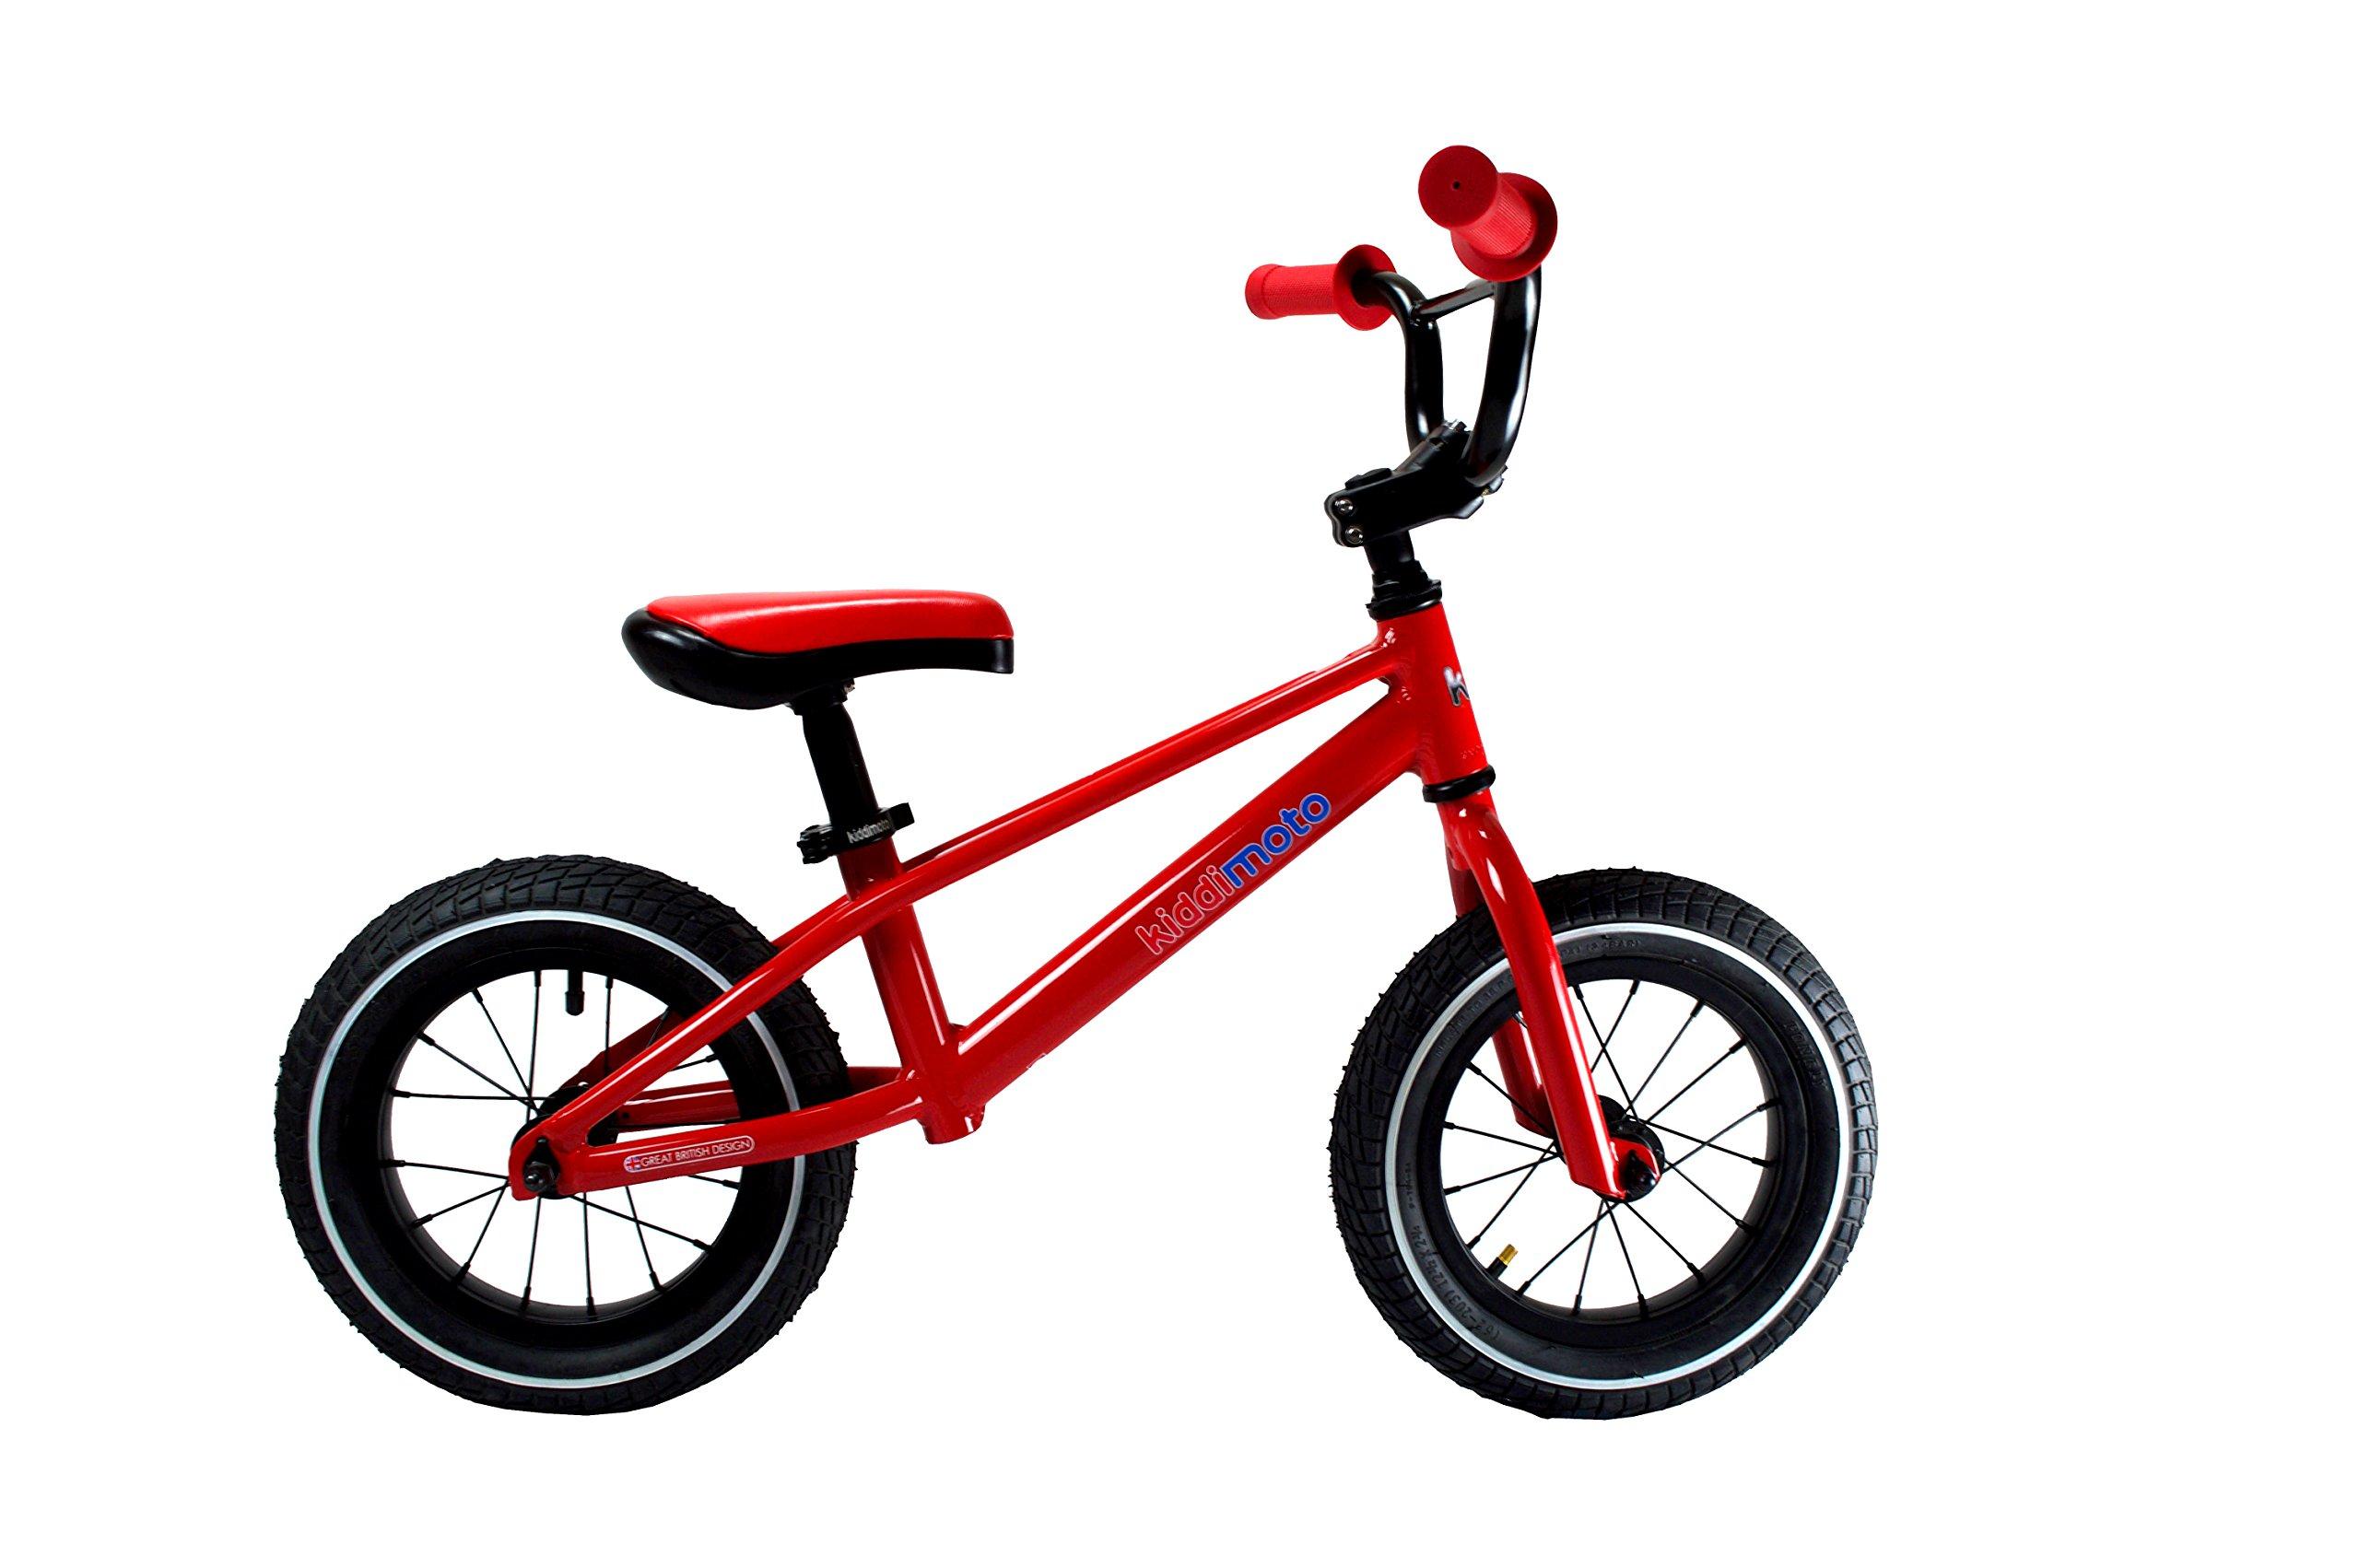 Kiddimoto BMX Running/Balance Bike, Red by Kiddimoto (Image #2)